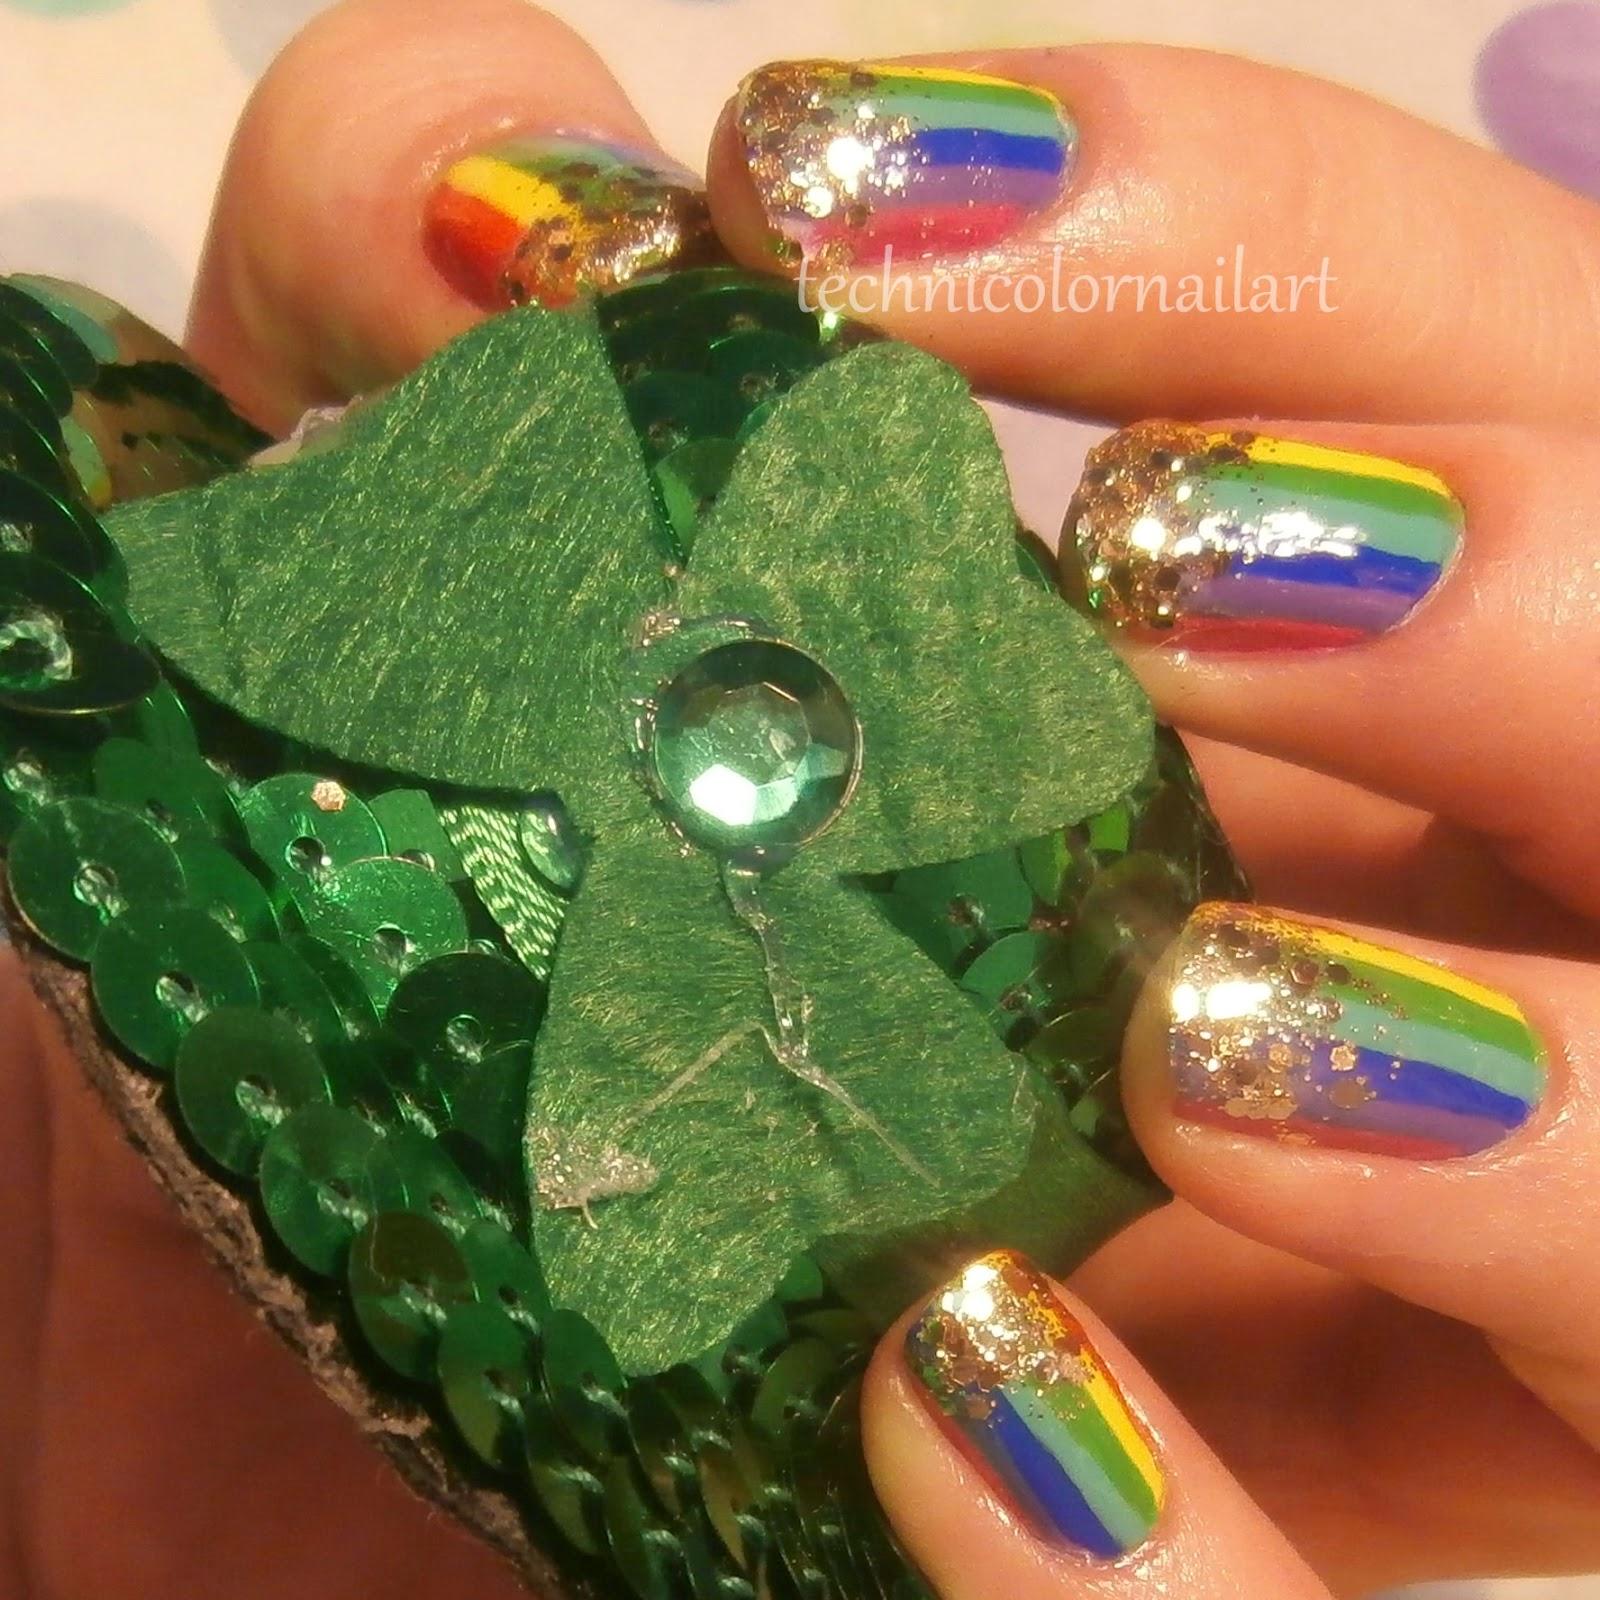 Technicolor Nail Art: Happy St. Patrick\'s Day!